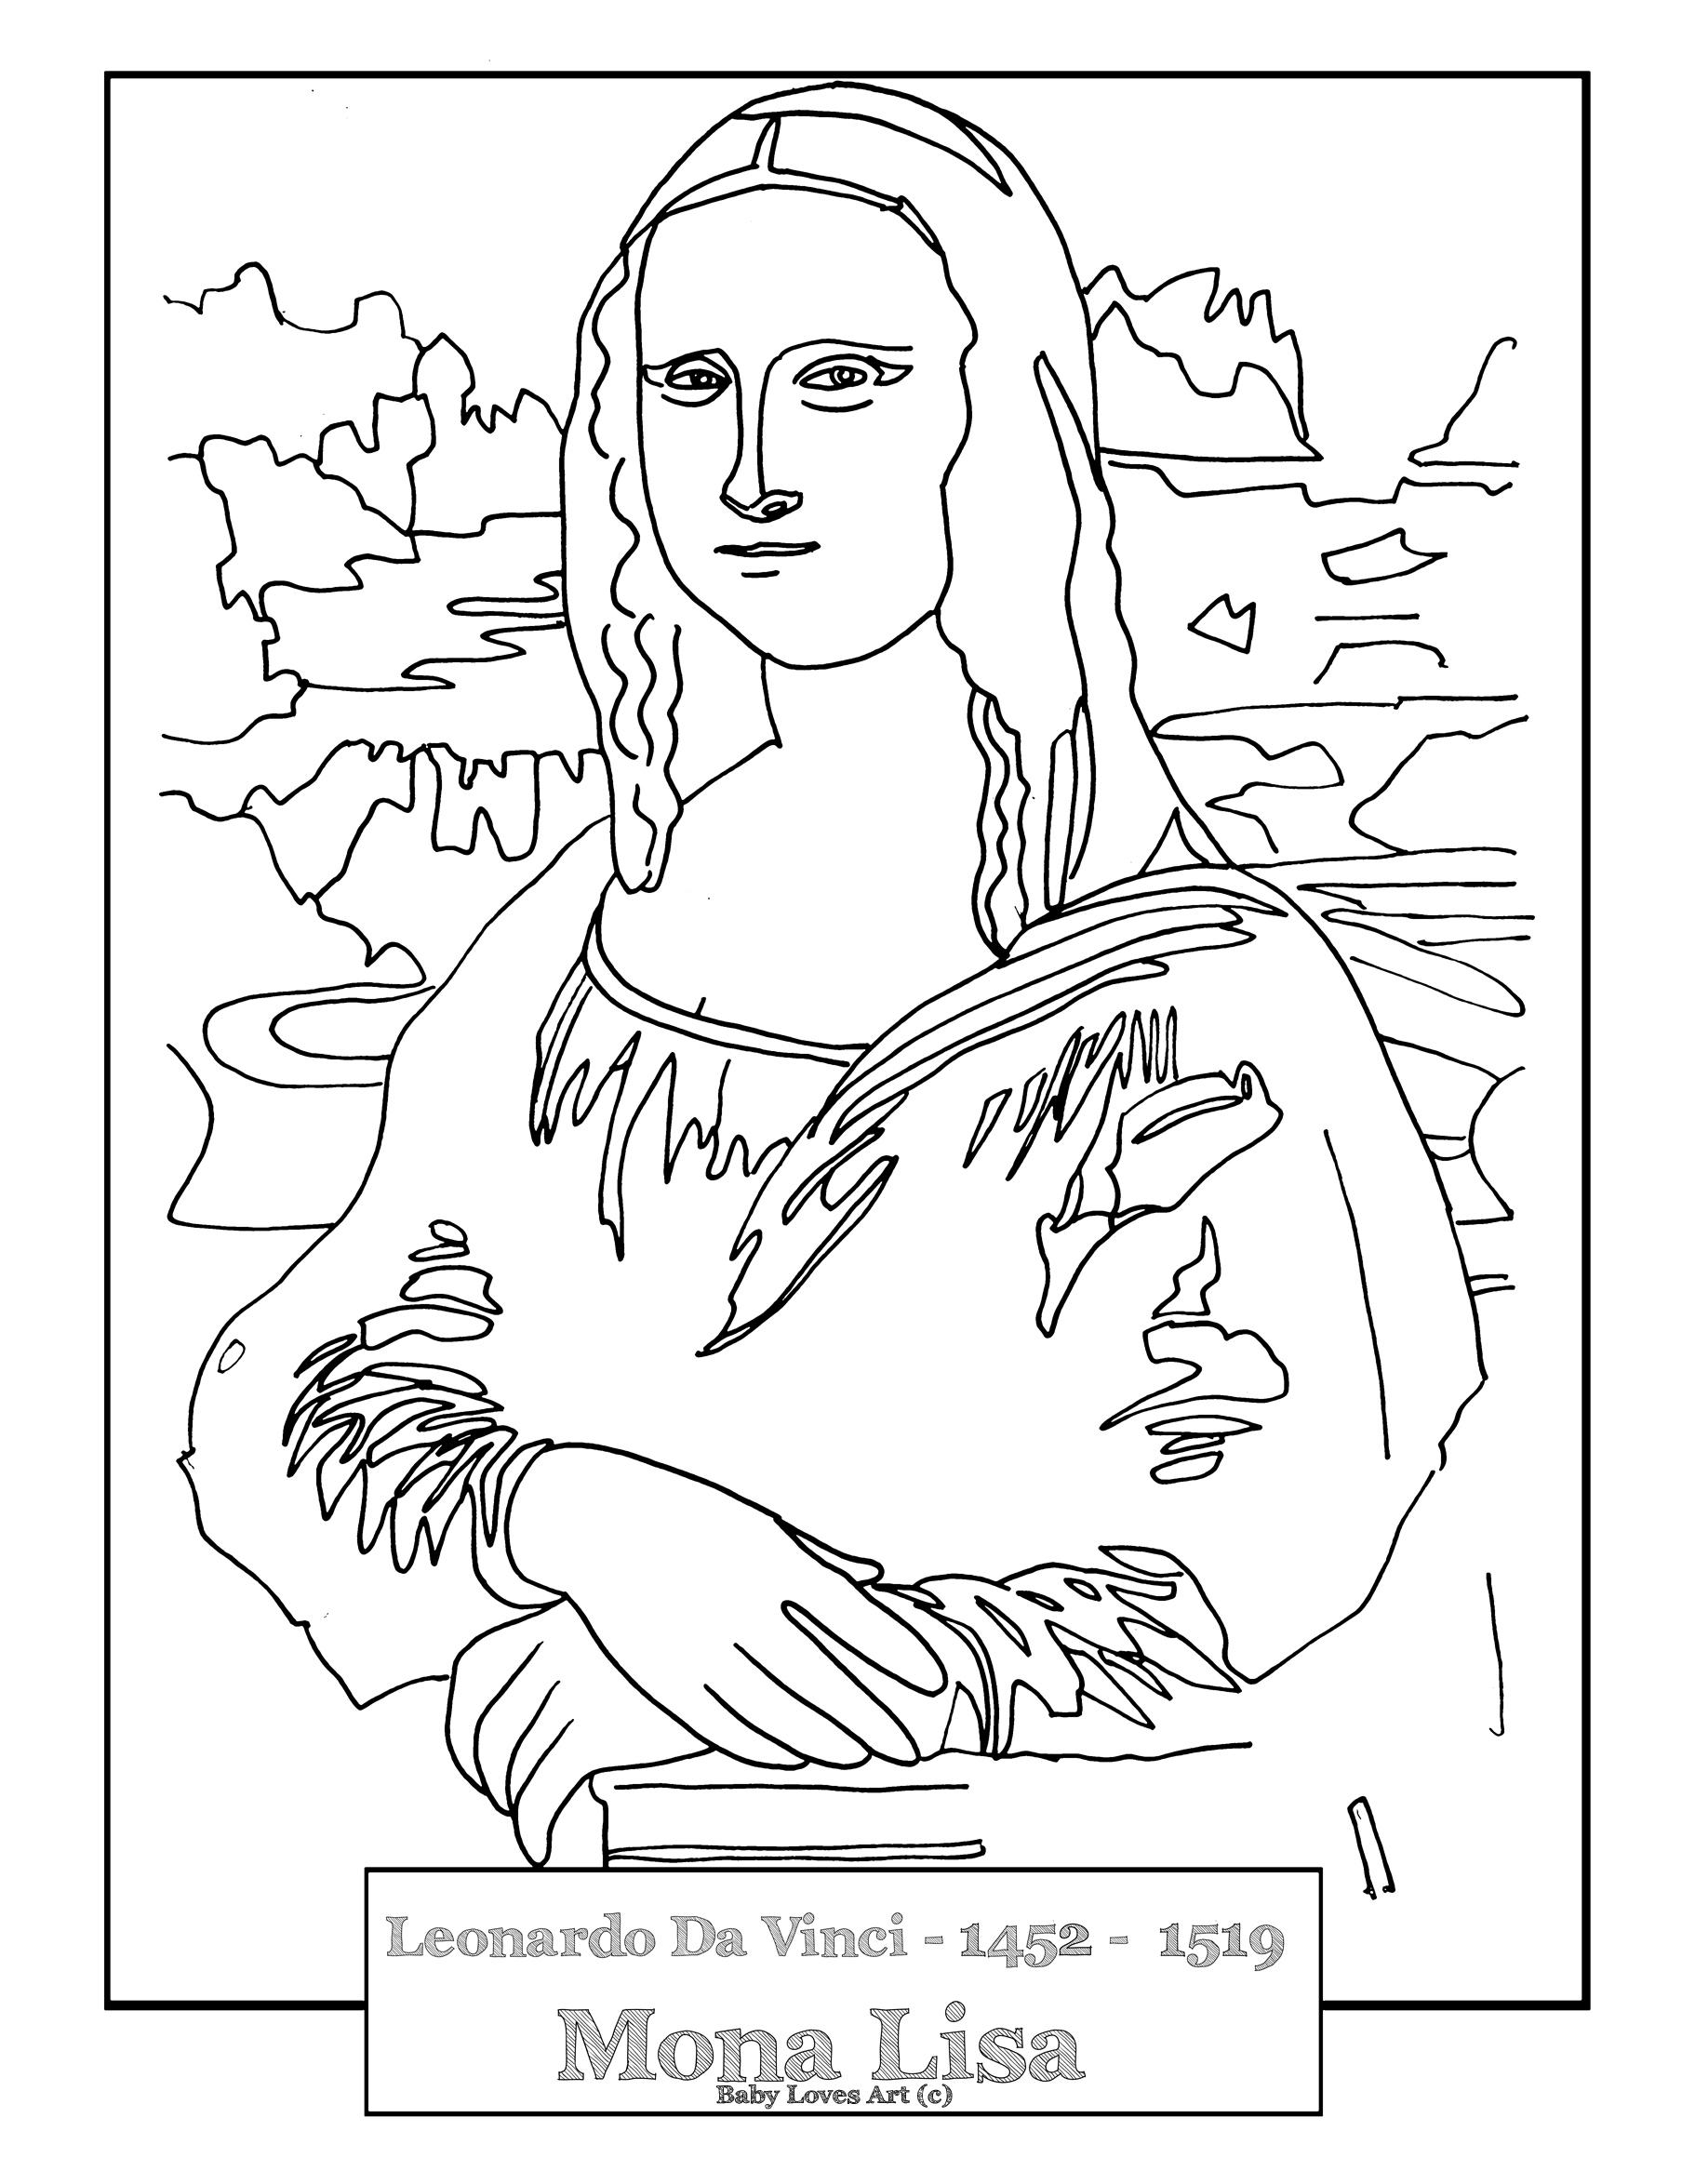 1822x2348 Mona Lisa Line Drawing Leonardo Da Vinci Mona Lisa 1452 1519